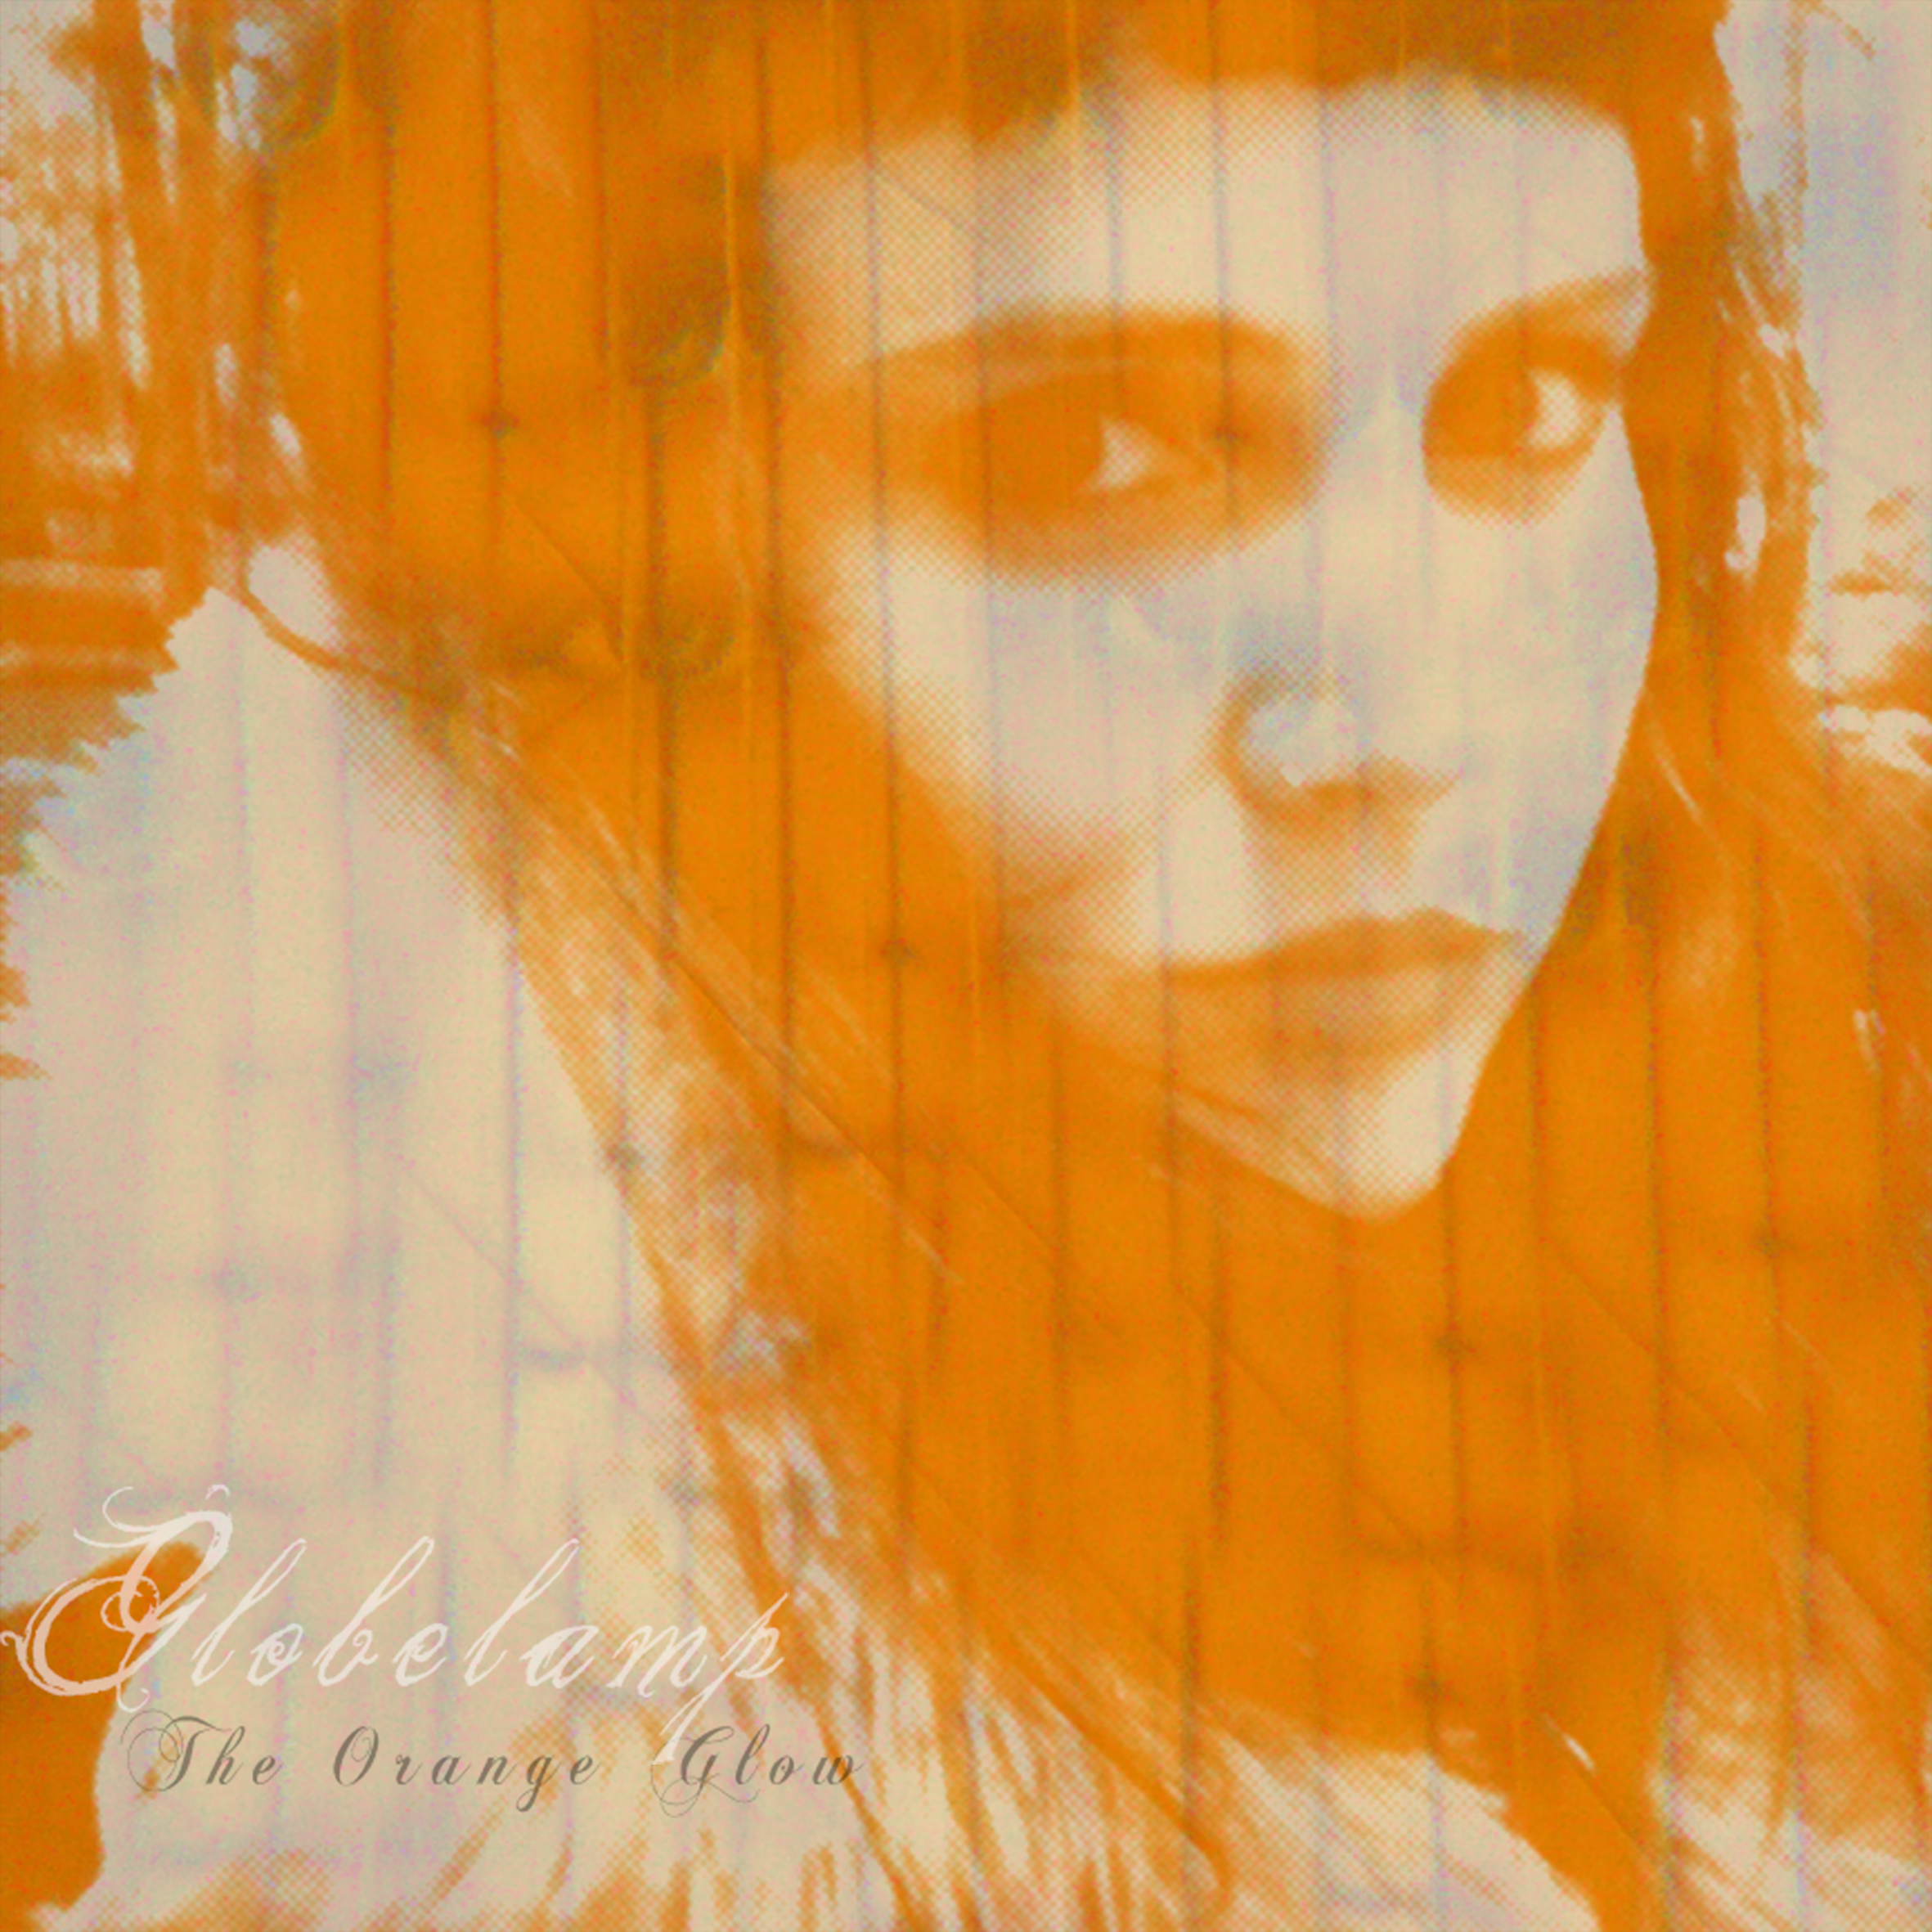 The Orange Glow (MP3)